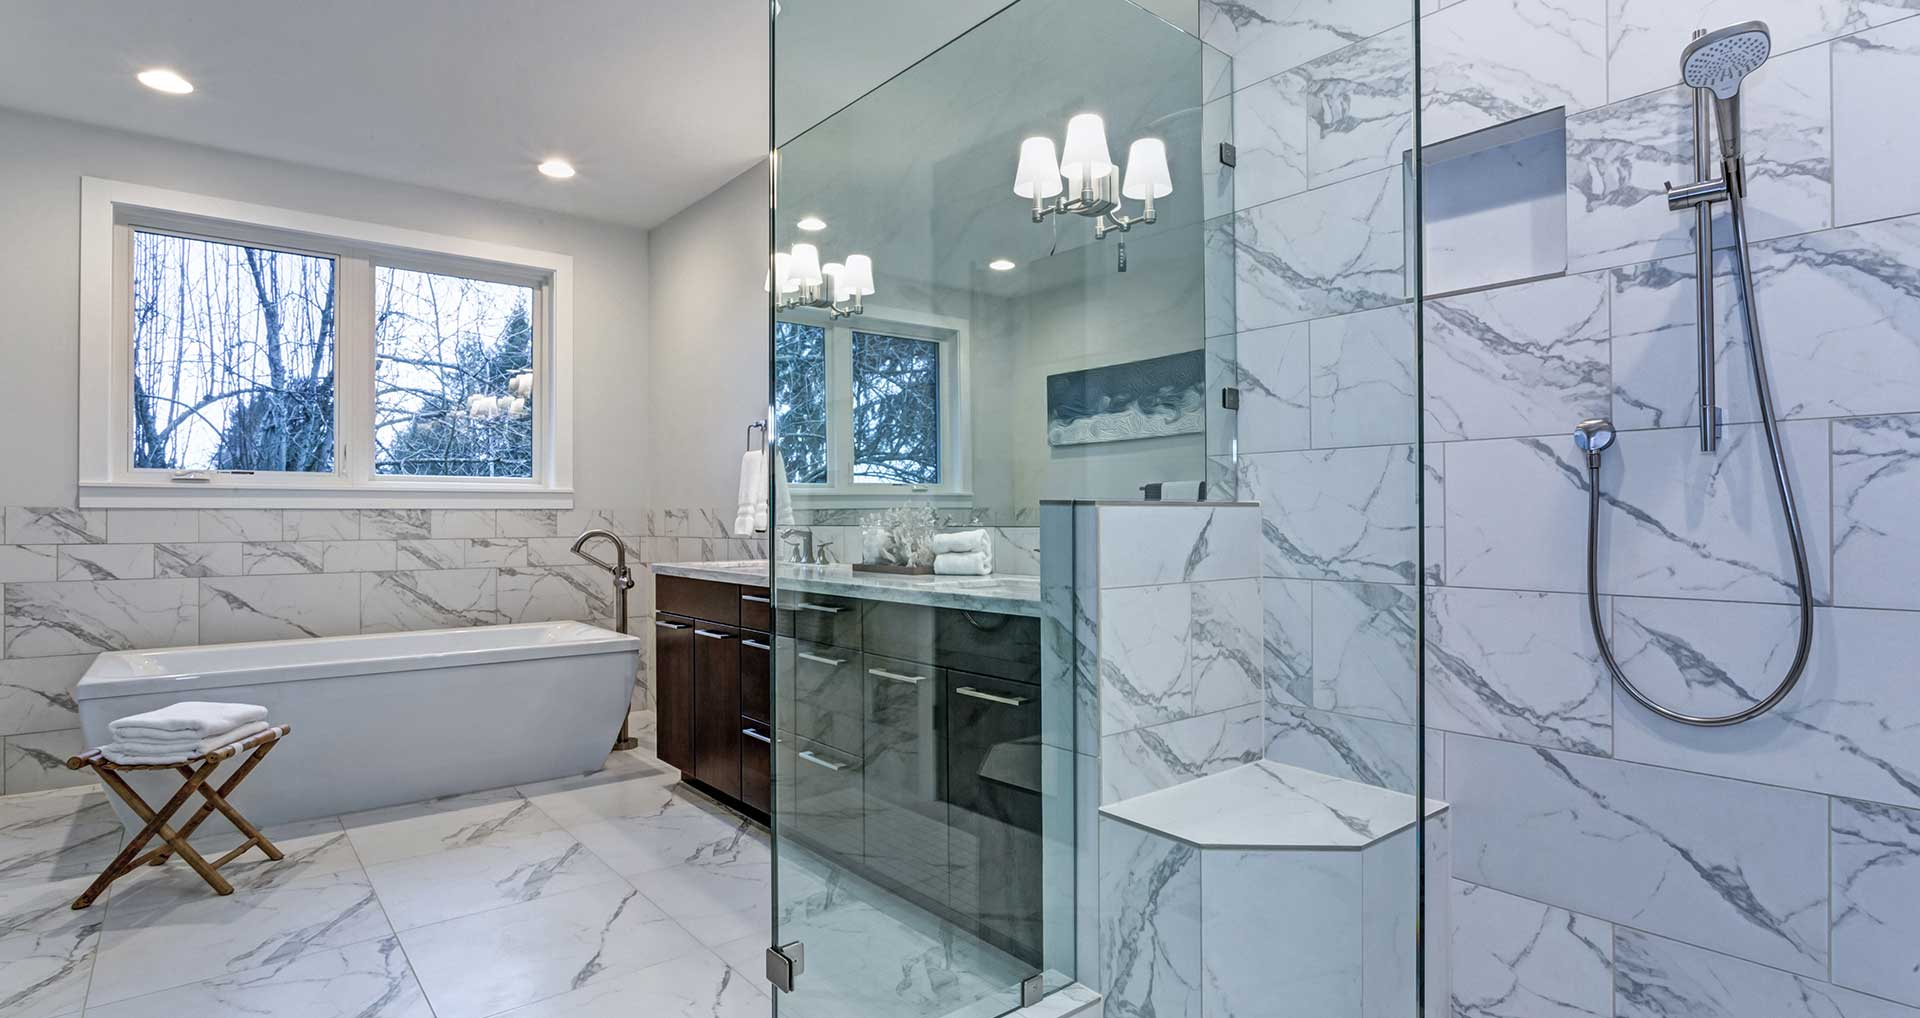 Shower Remodeling Picture - Seota Digital Marketing Frisco, TX - Dallas, TX